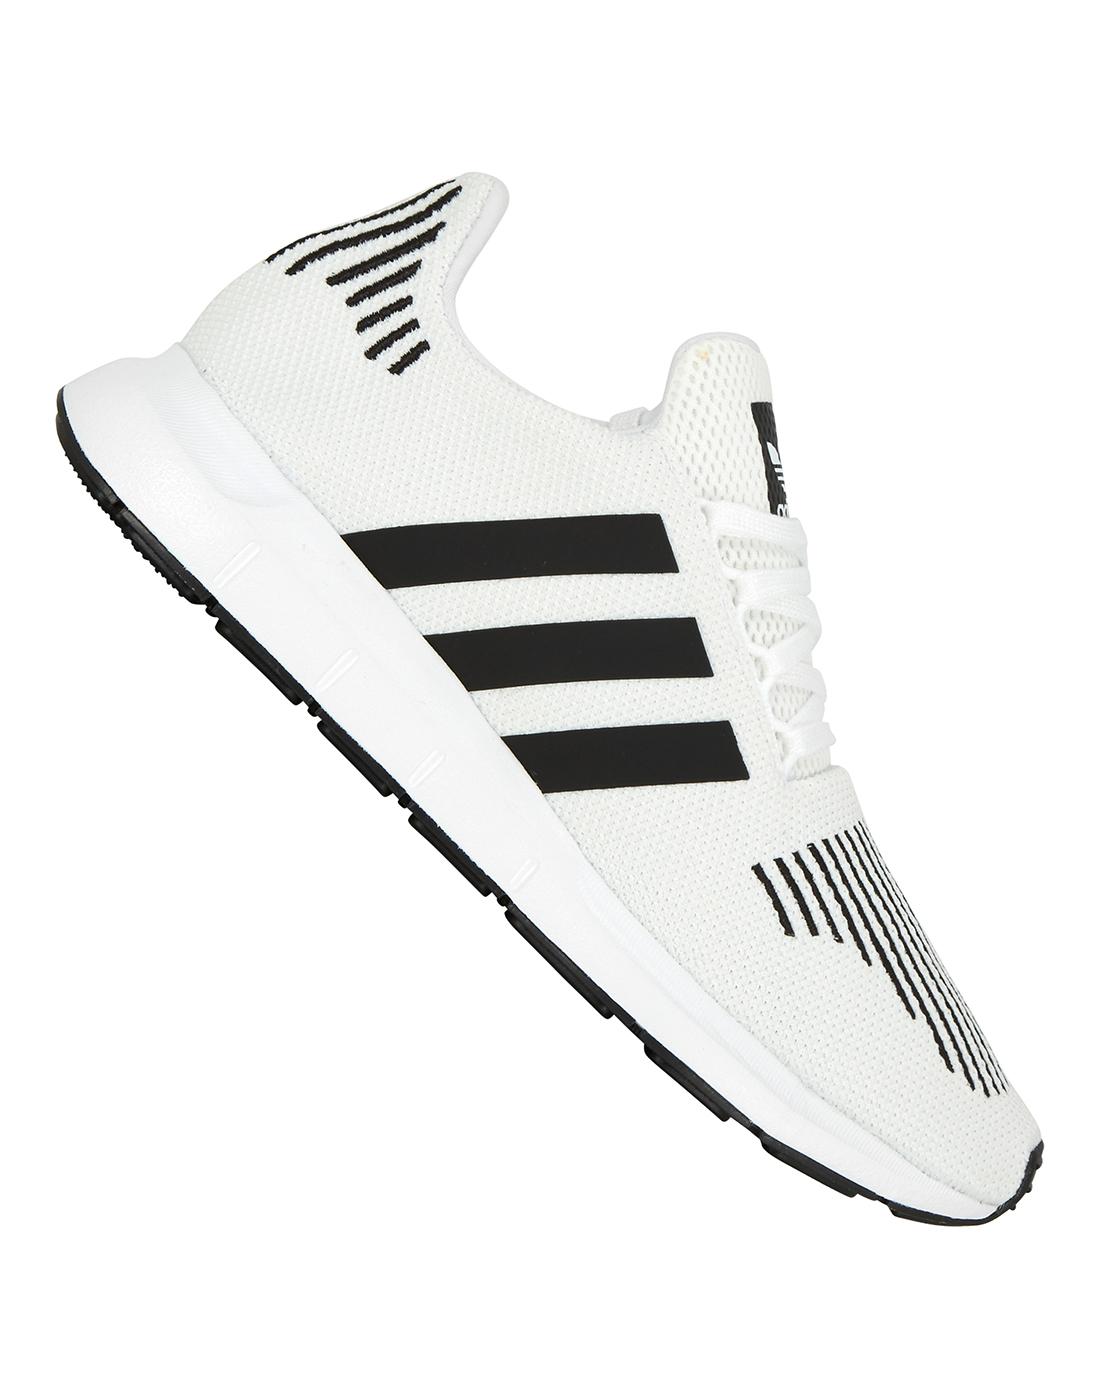 3f849cea8 adidas Originals Mens Swift Run